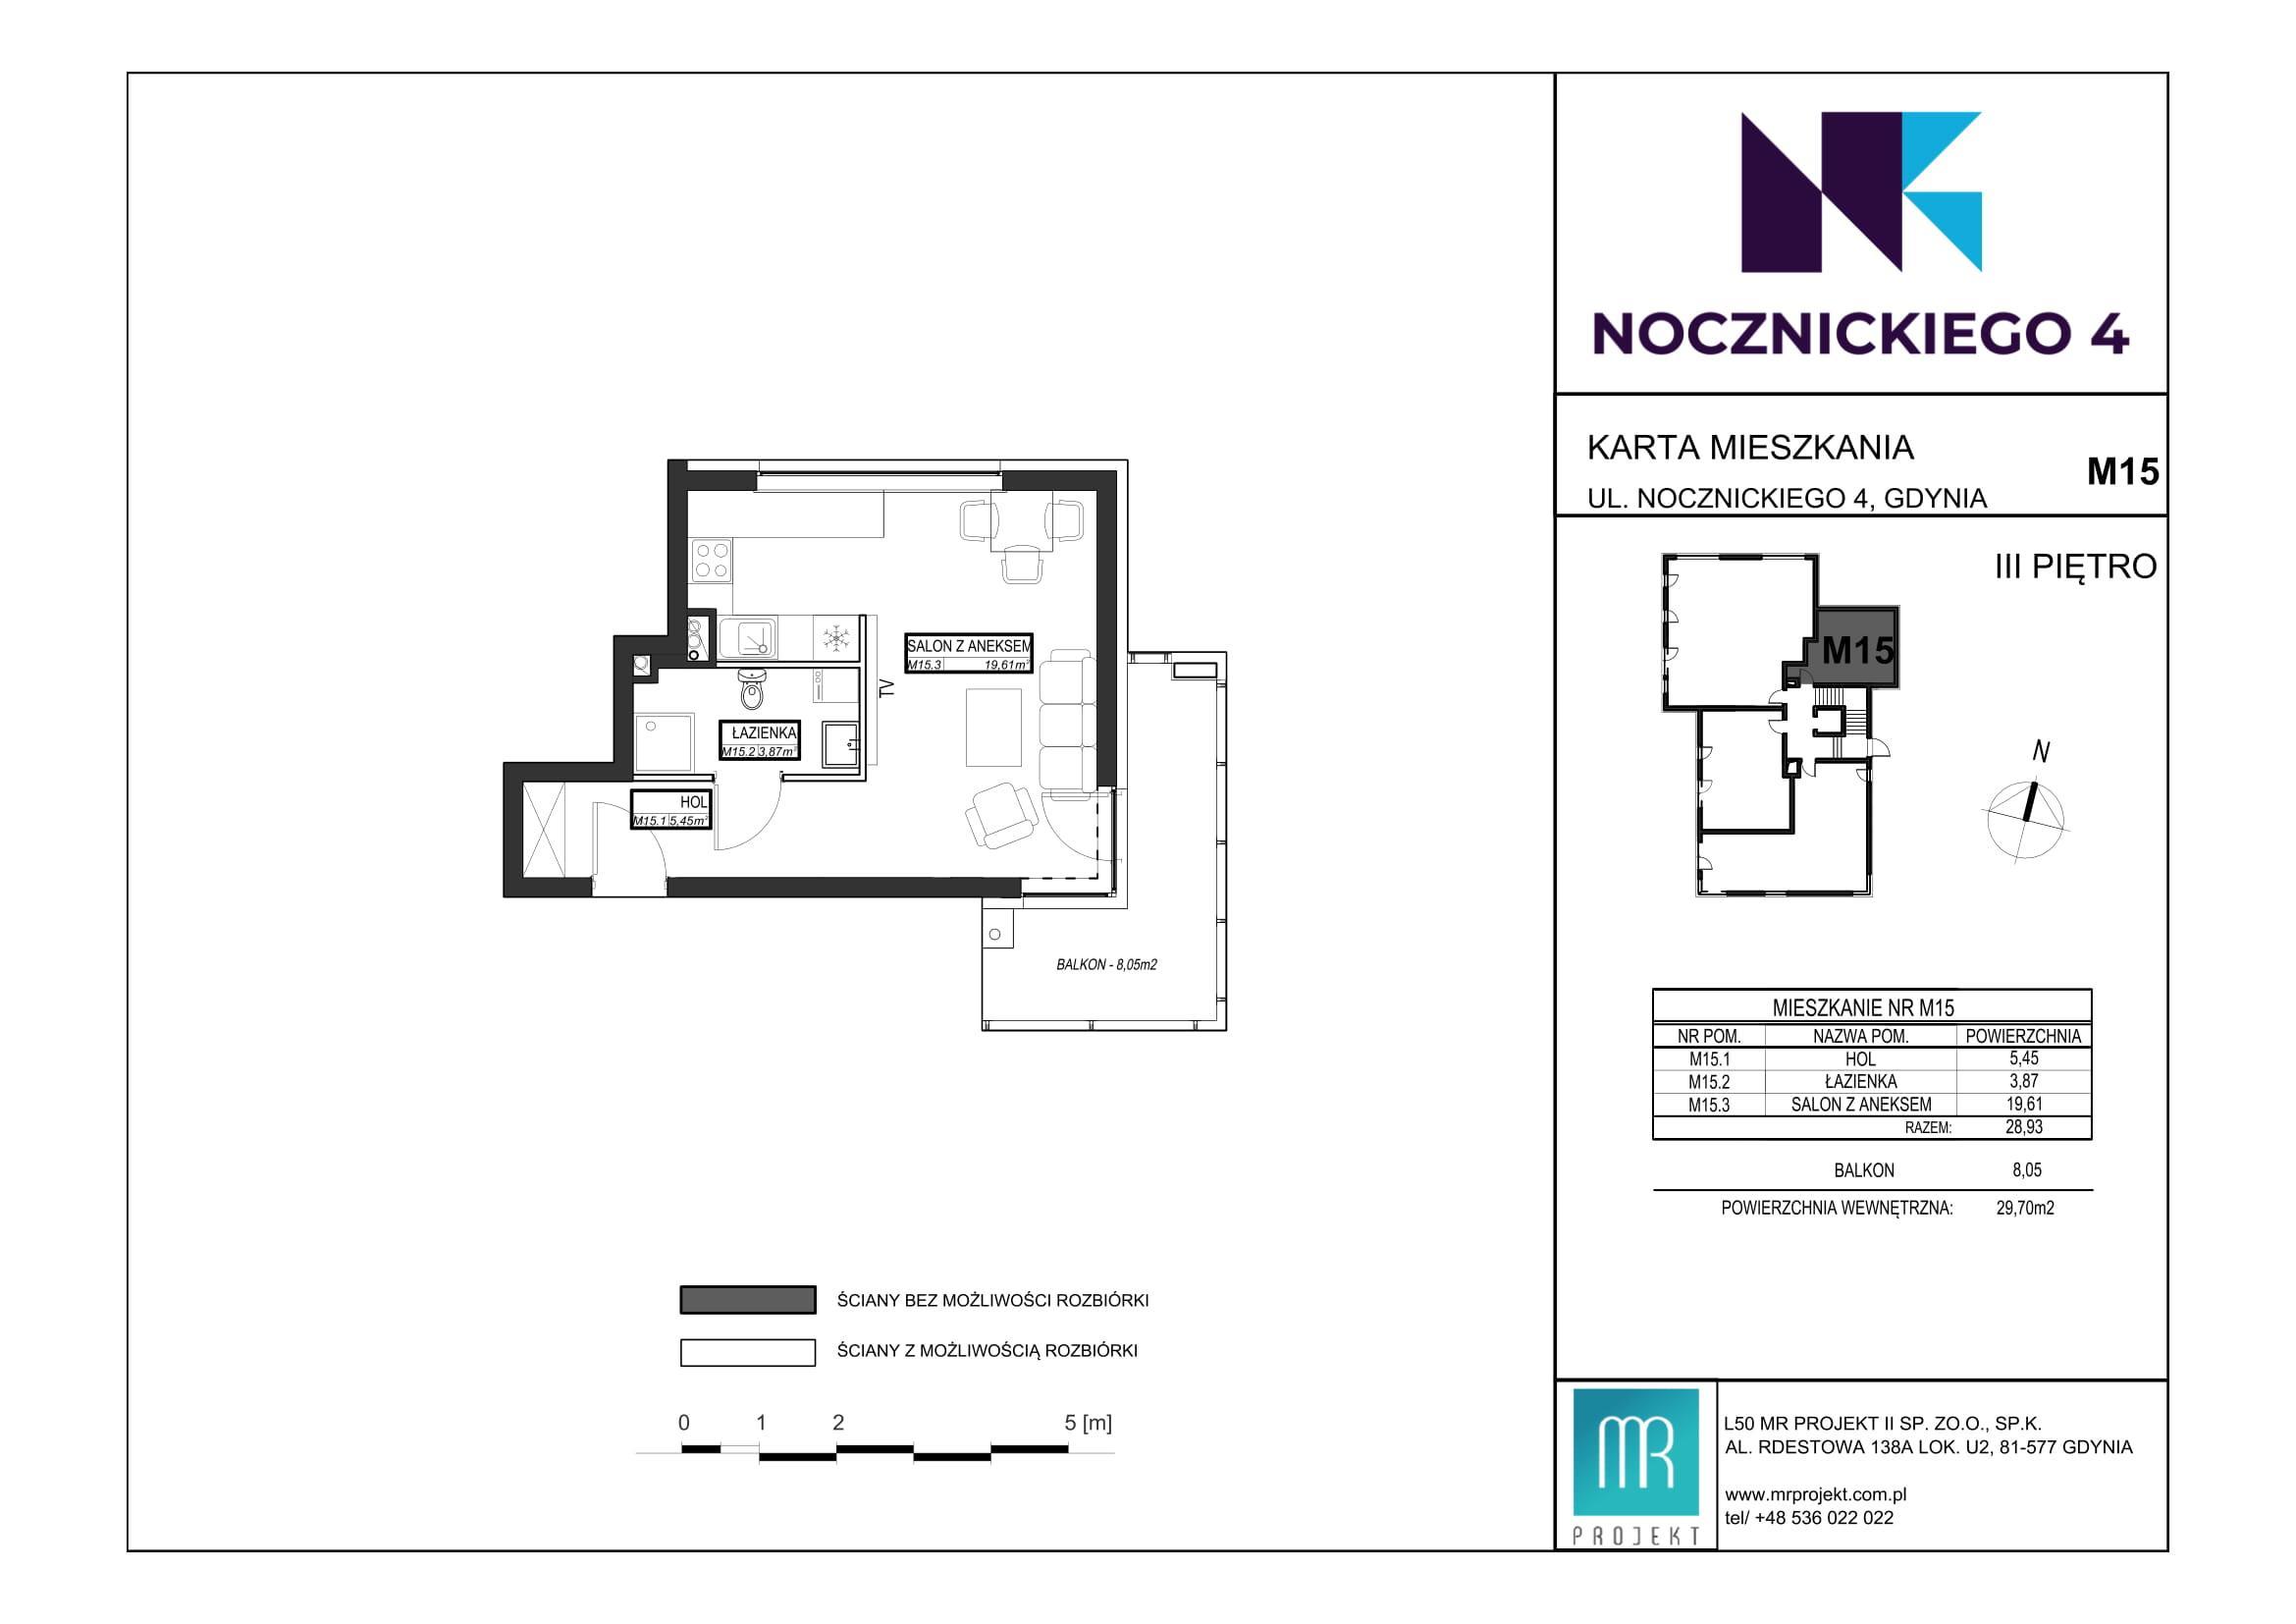 Rzut mieszkania M15